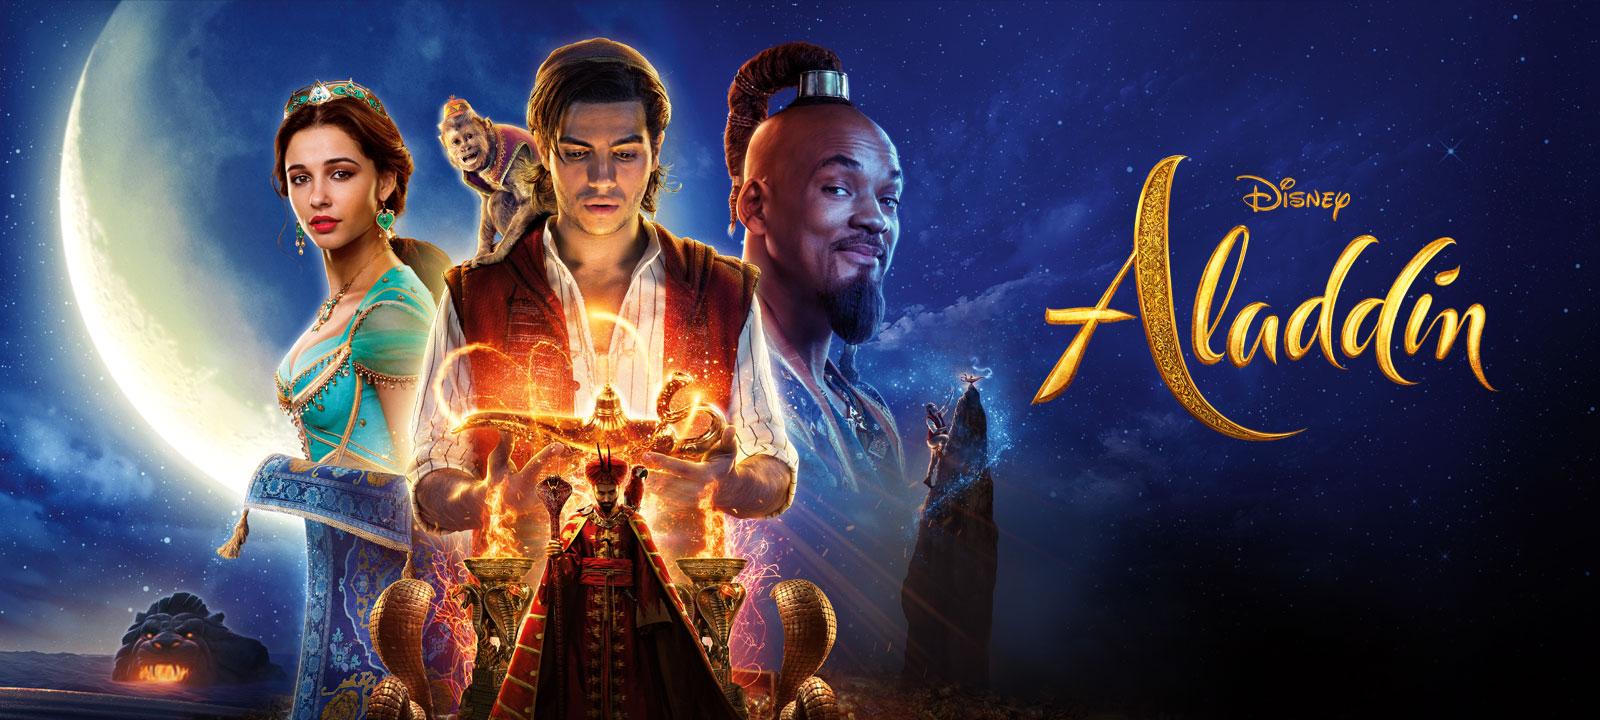 Aladdin (2019) - Aladdin (Live-action) (2019)